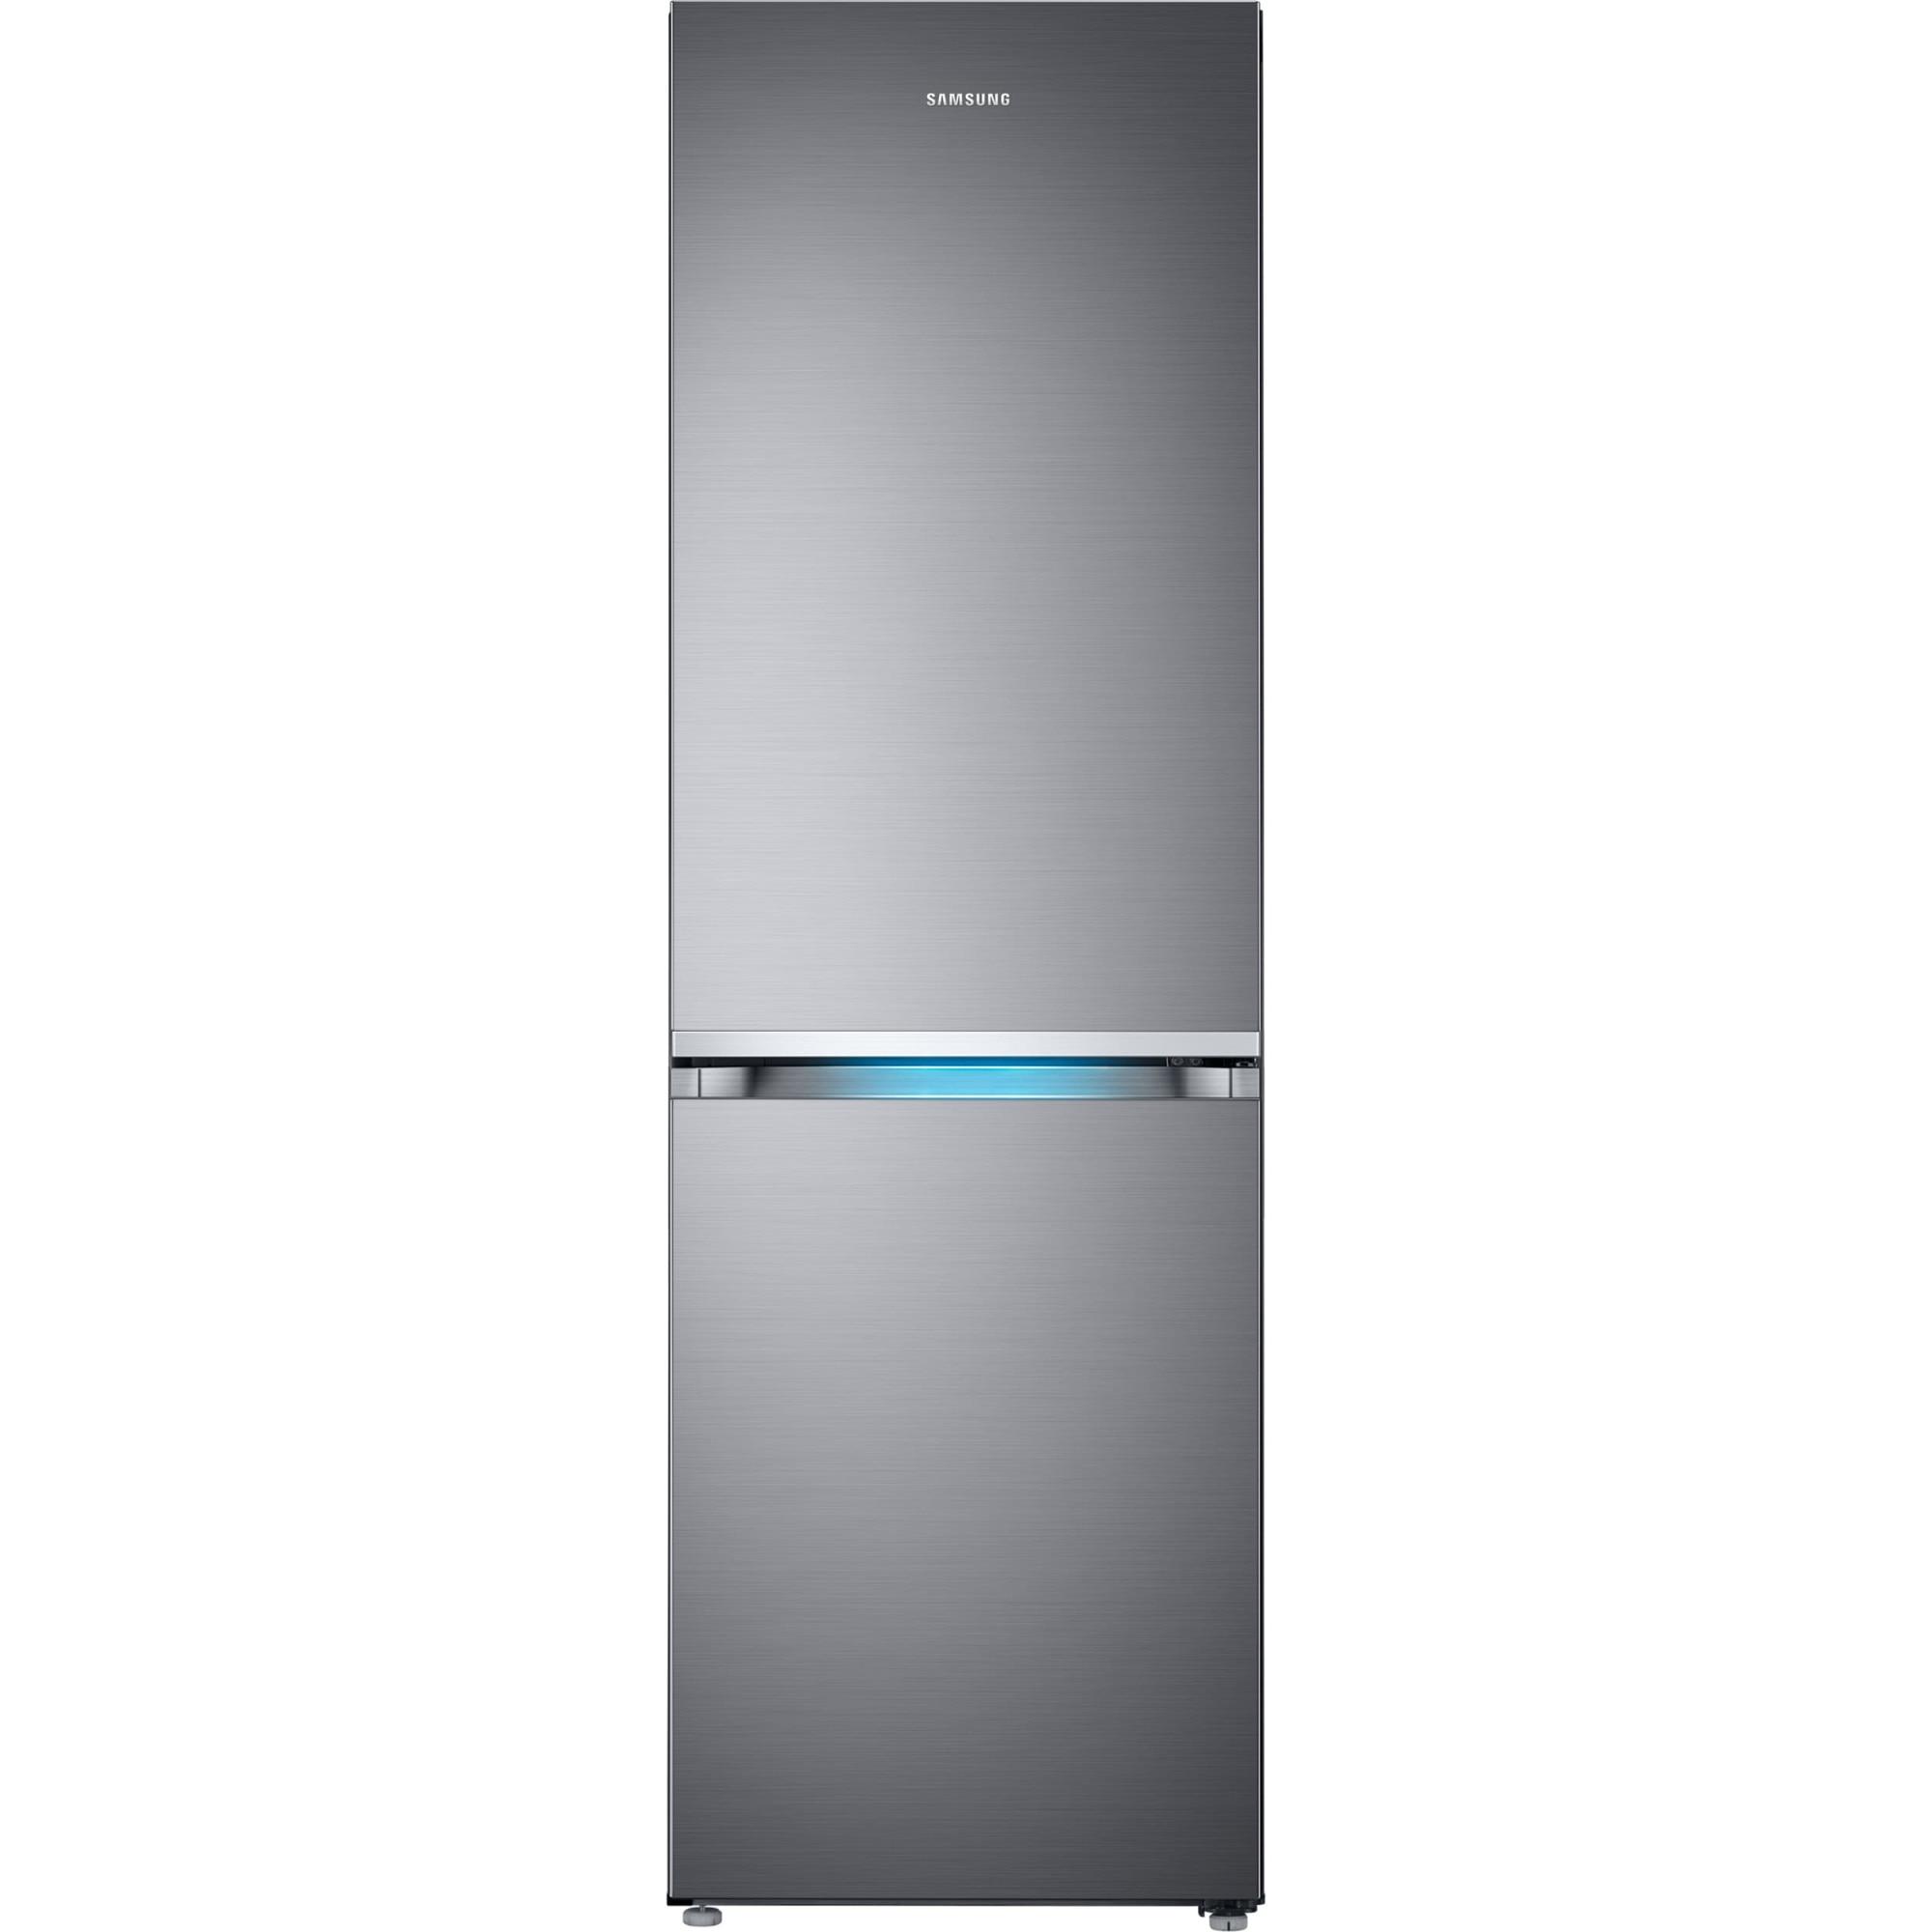 Fotografie Combina frigorifica Samsung RB38R7717S9/EF, 382L, NoFrost, Clasa A++, H 192.7 cm, Argintiu